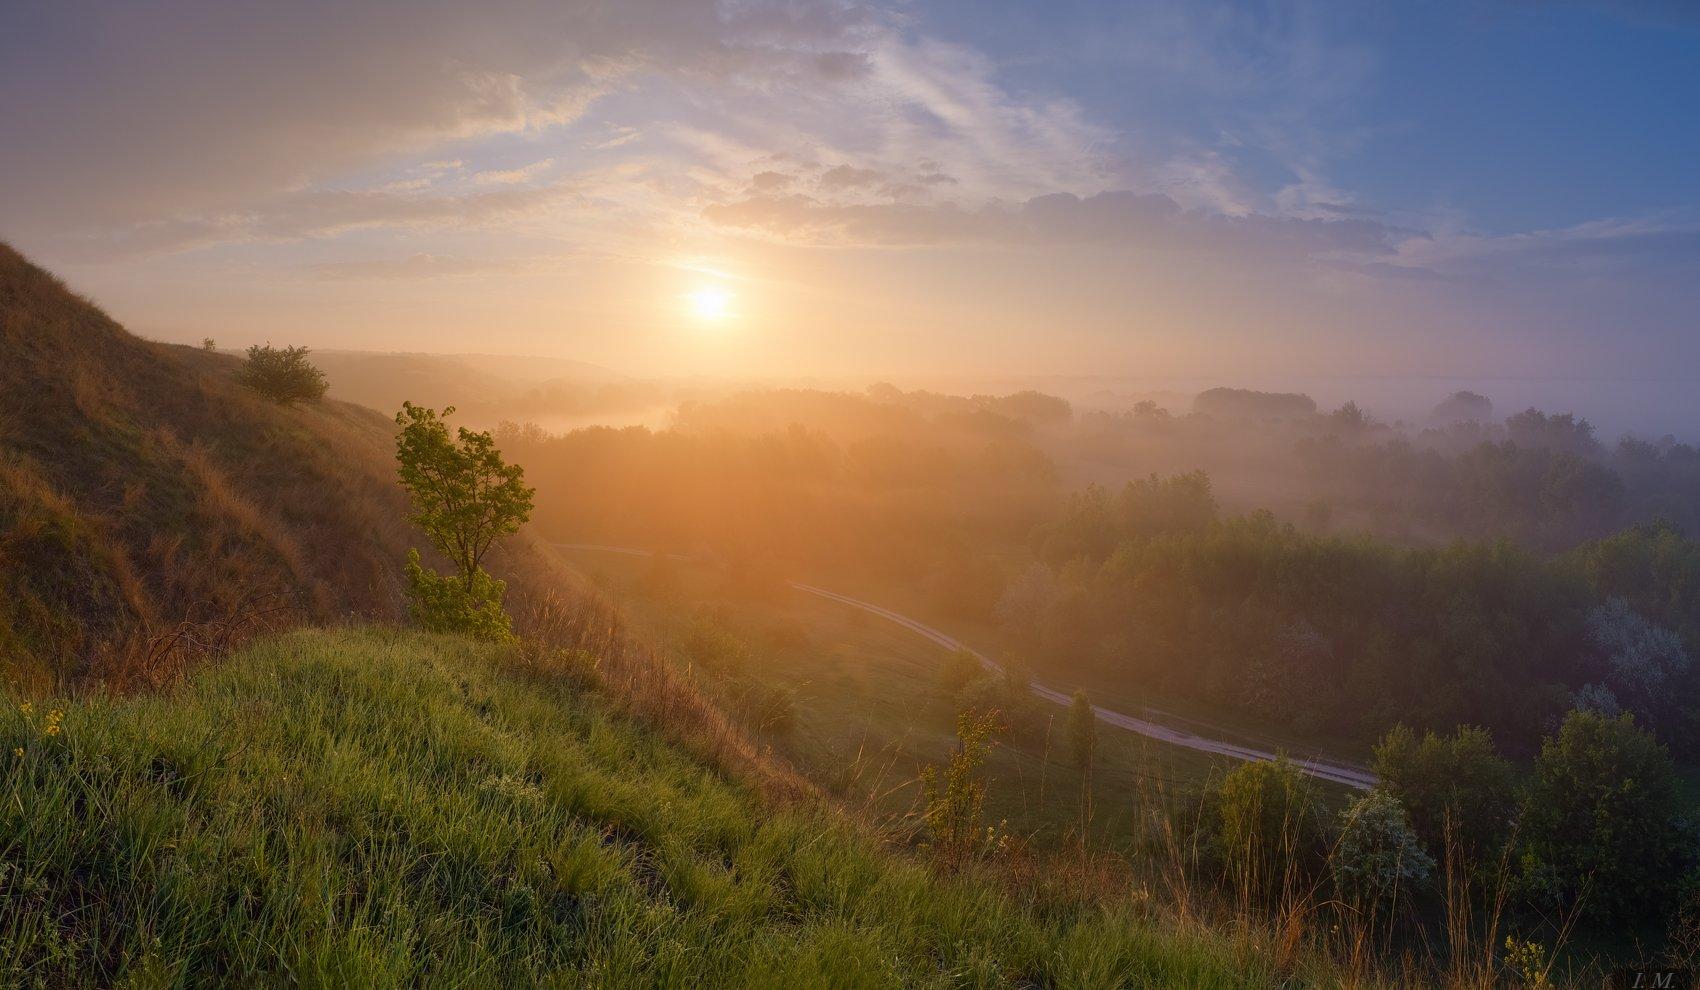 утро, рассвет, солнце, туман, весна, холмы, долина, панорама, свет, золотой, пейзаж, облака, morning, fog, light, colors, golden, sun, misty, valley, grass, hills, foggy, spring, sunrise, landscape, panorama, sunlight, countryroad, clouds, Ivan Maljarenko